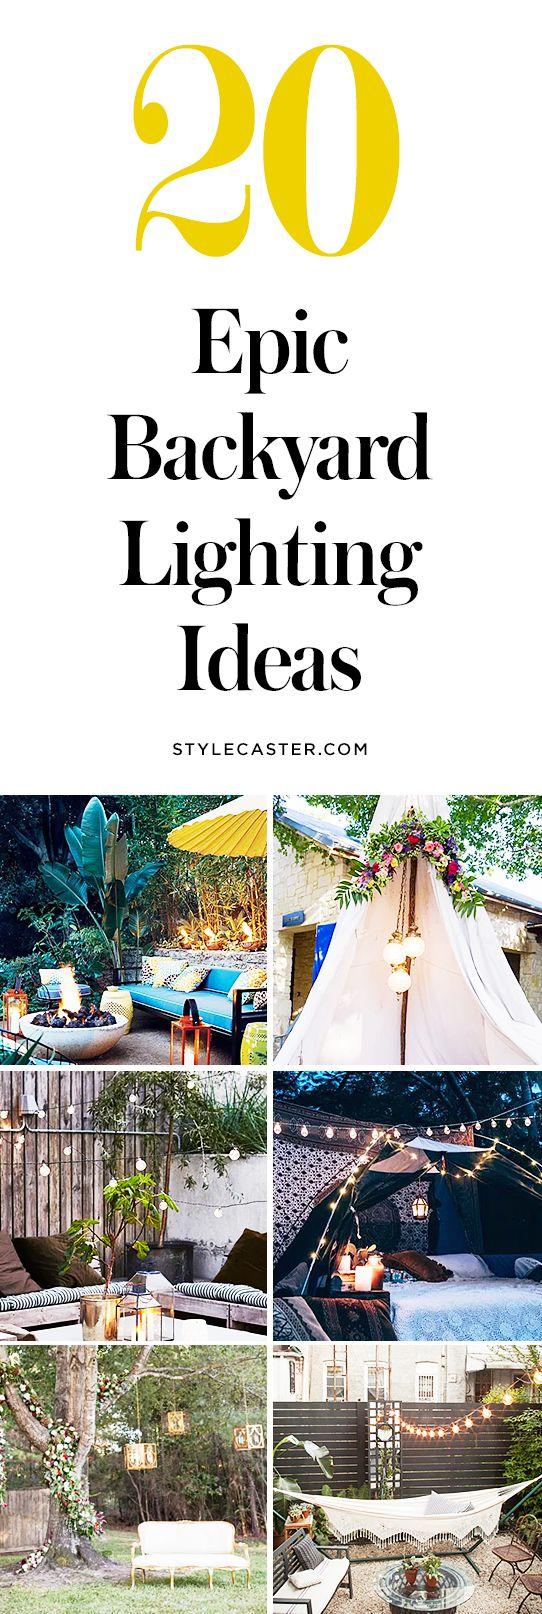 20 Epic Backyard Lighting Ideas to Inspire your Patio Makeover | DIY Summer Outdoor Design Inspiration | @stylecaster